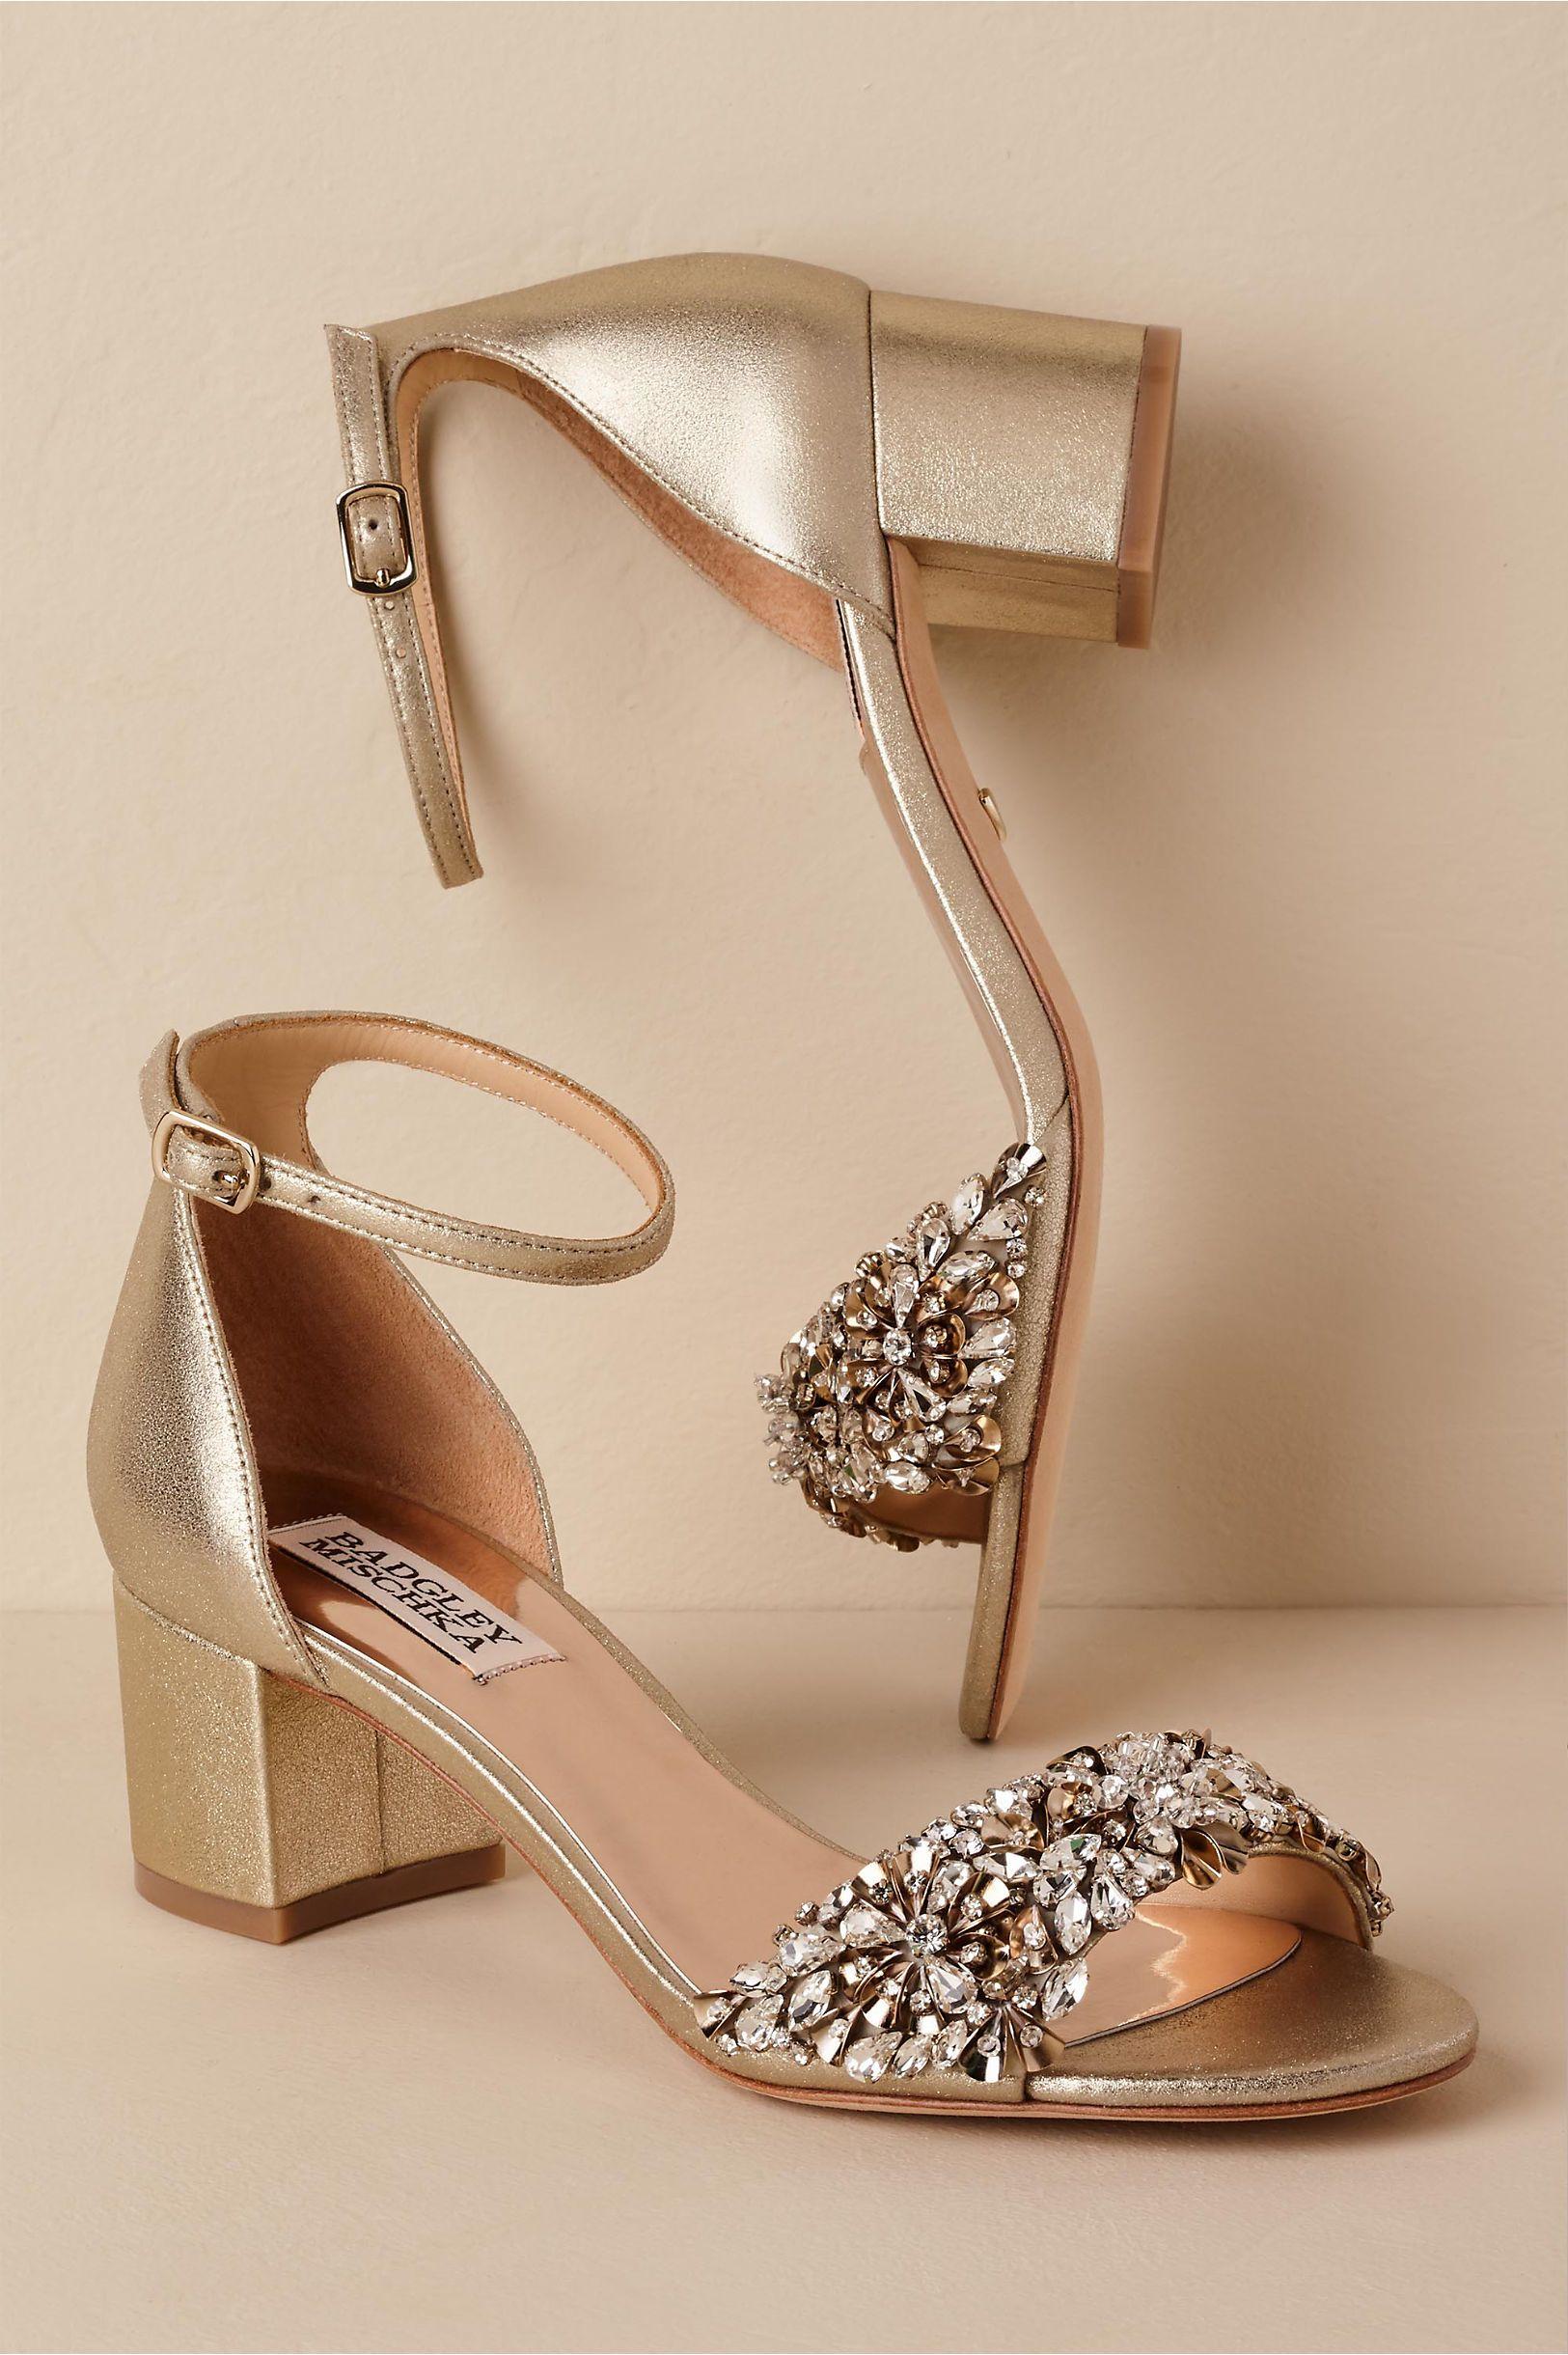 Bhldnus badgley mischka vega heels in neutral wedding pinterest